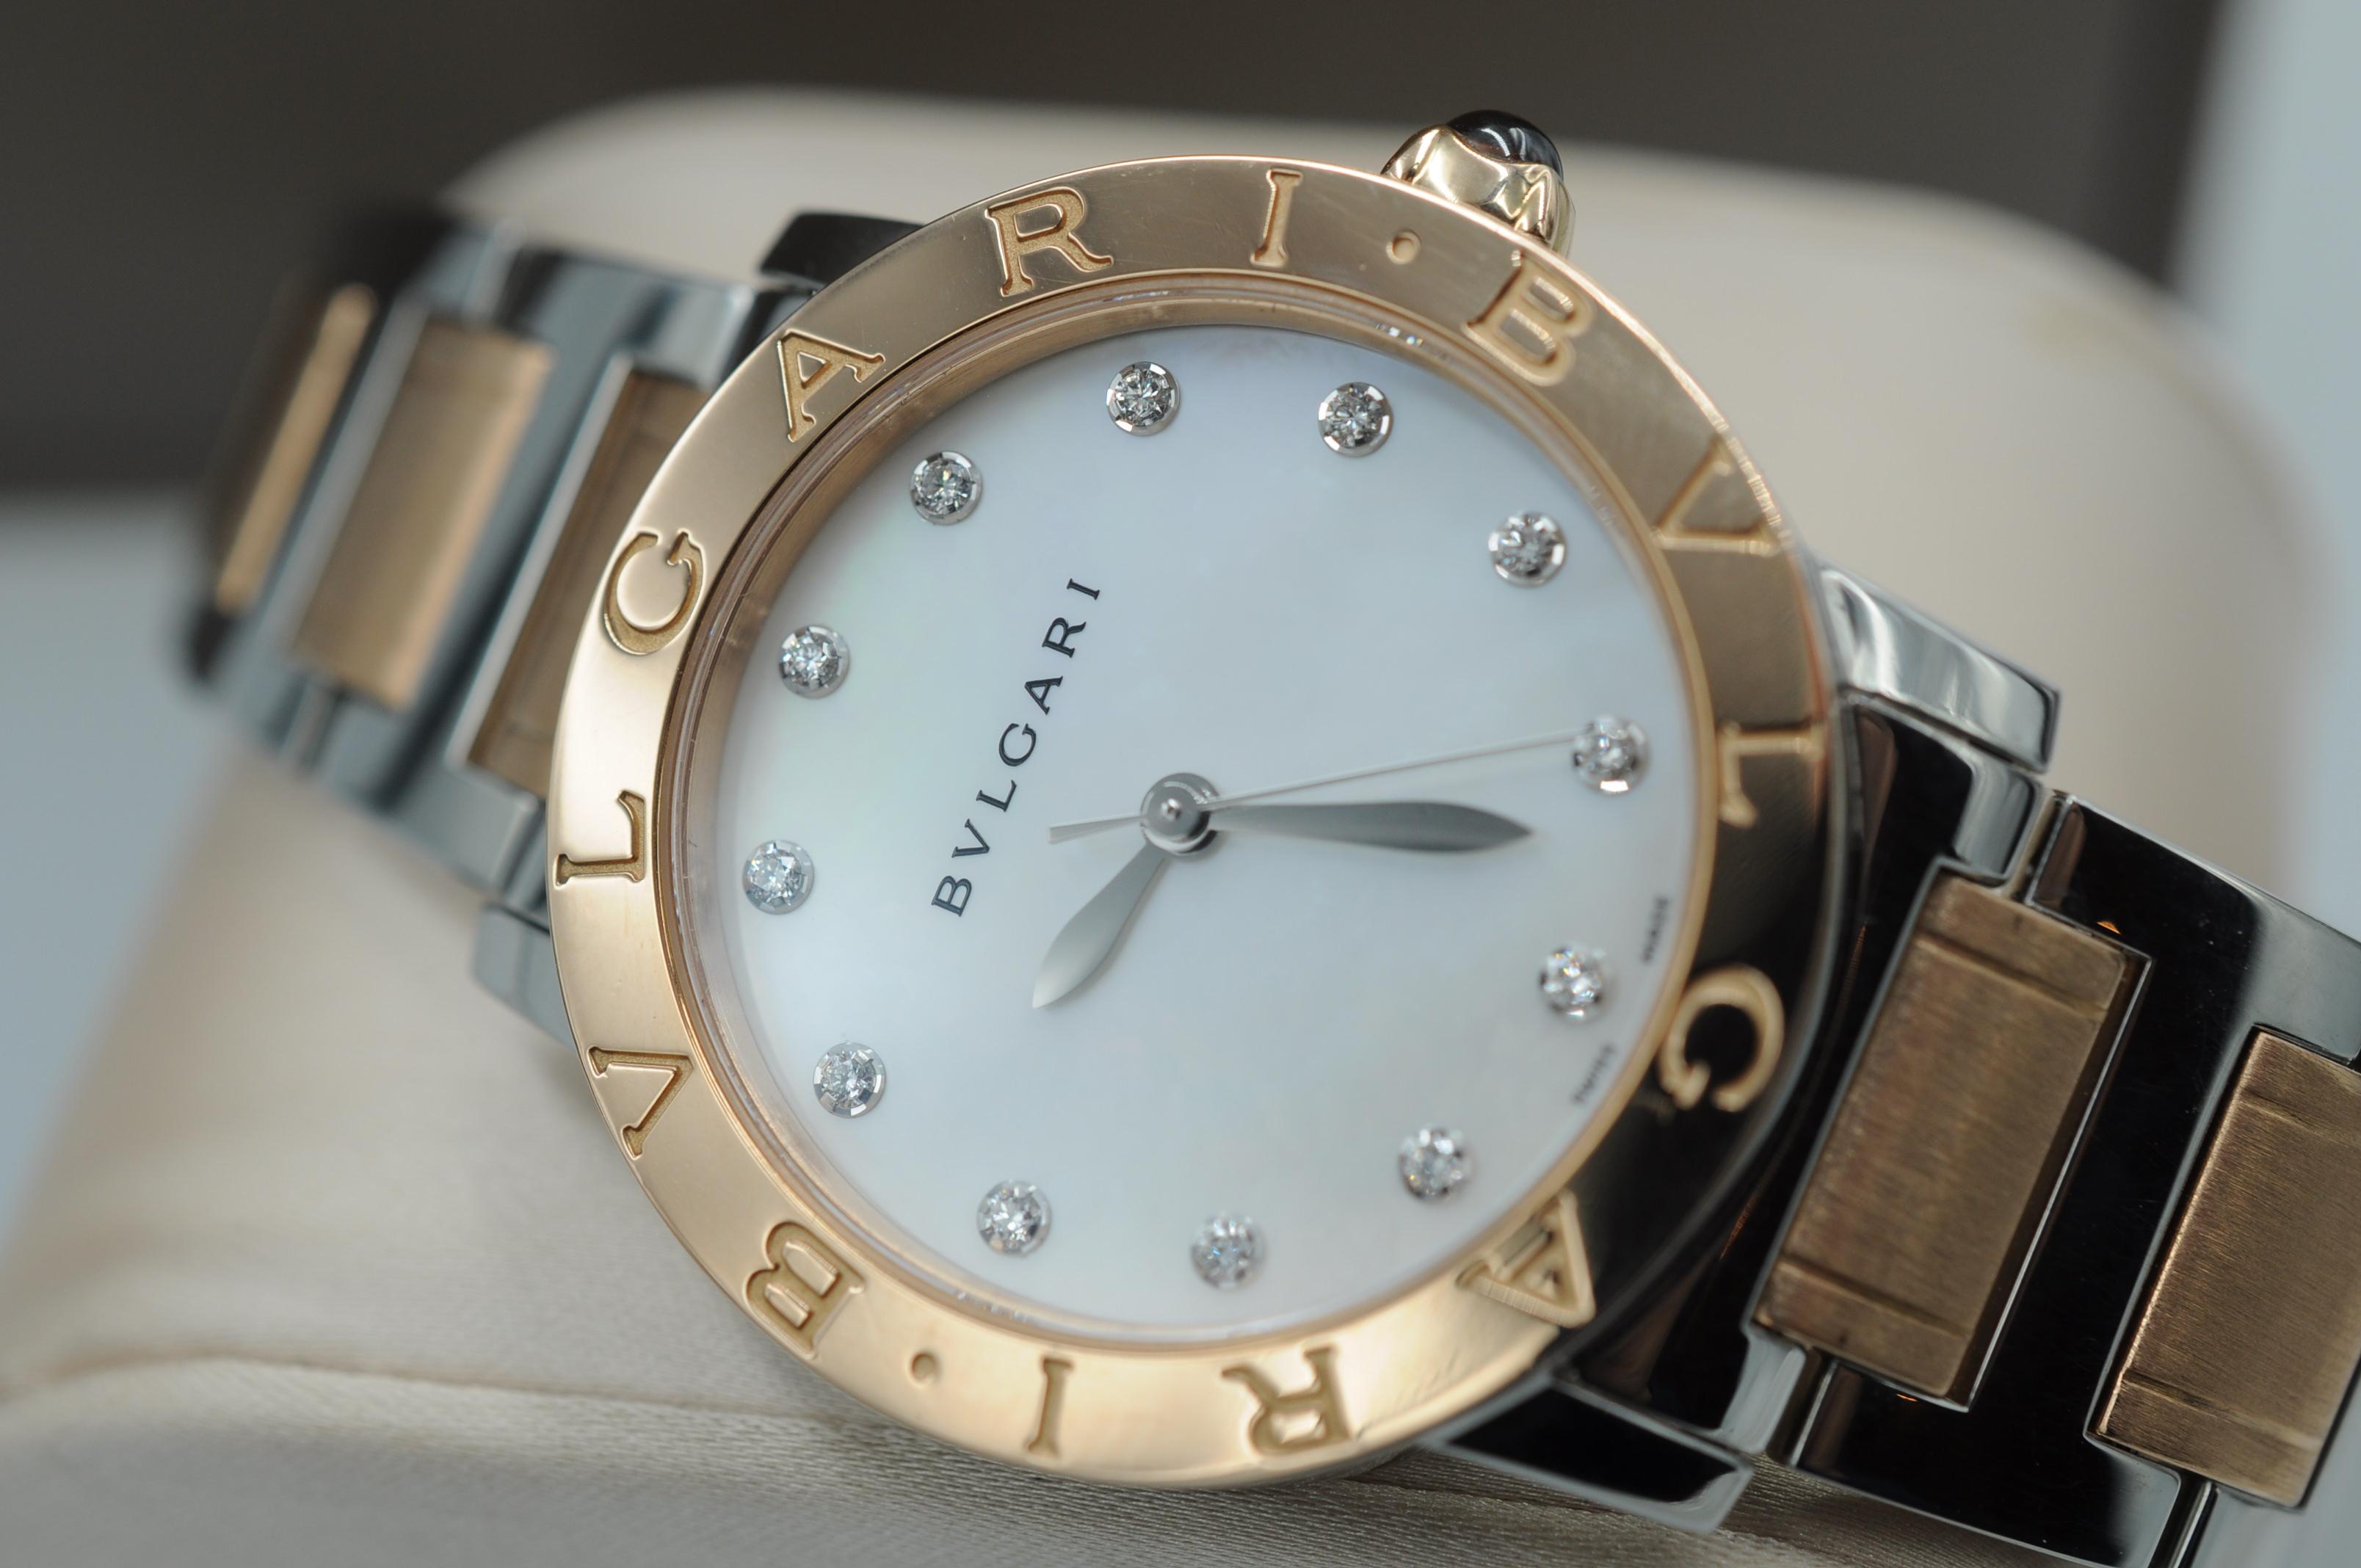 Bulgari Bulgari Ladies watch - Edinburgh Watch Company